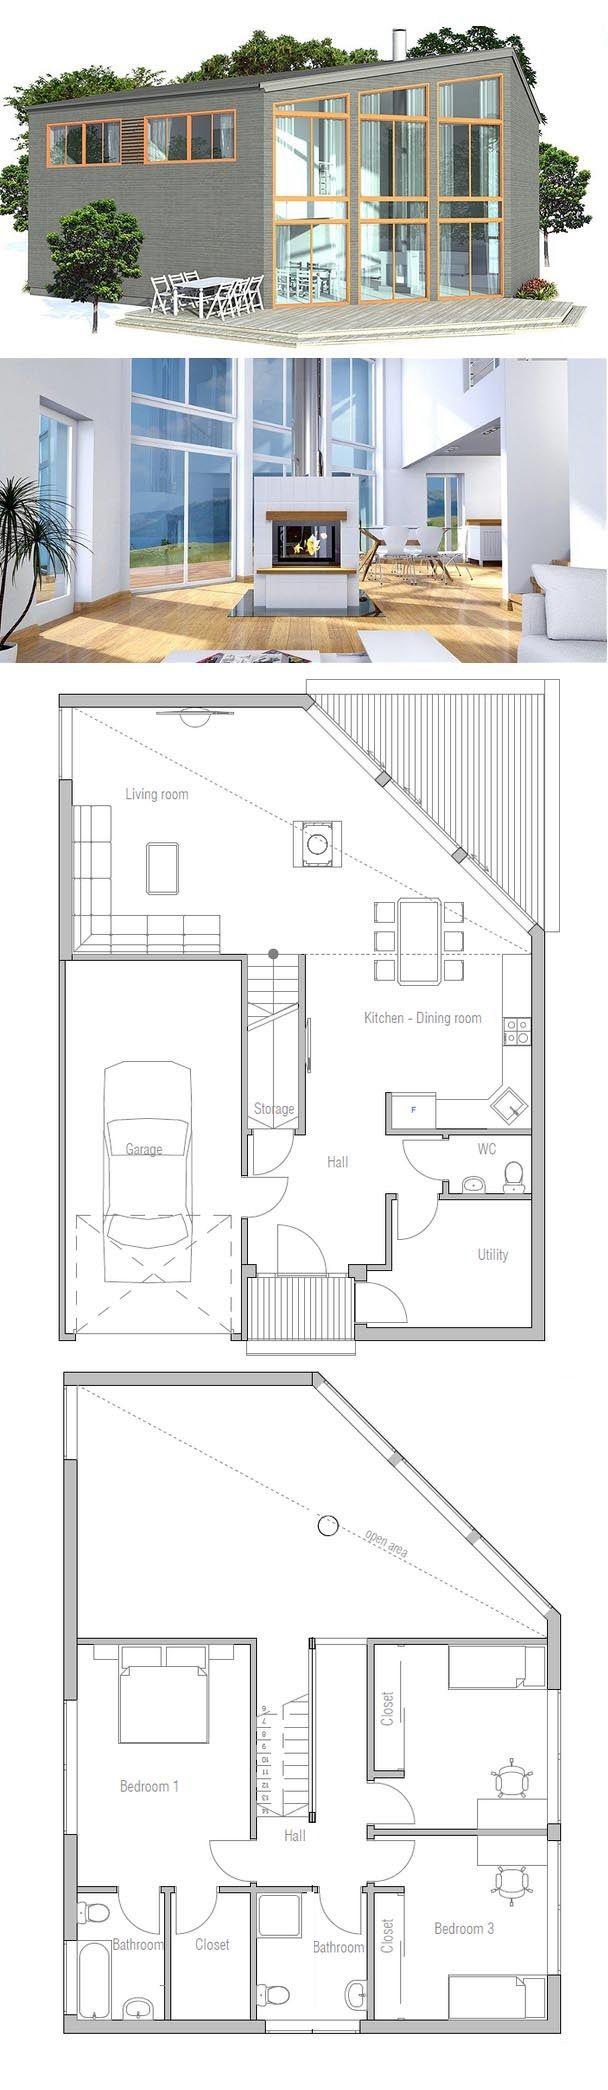 16 best narrow lots images on pinterest narrow lot house plans